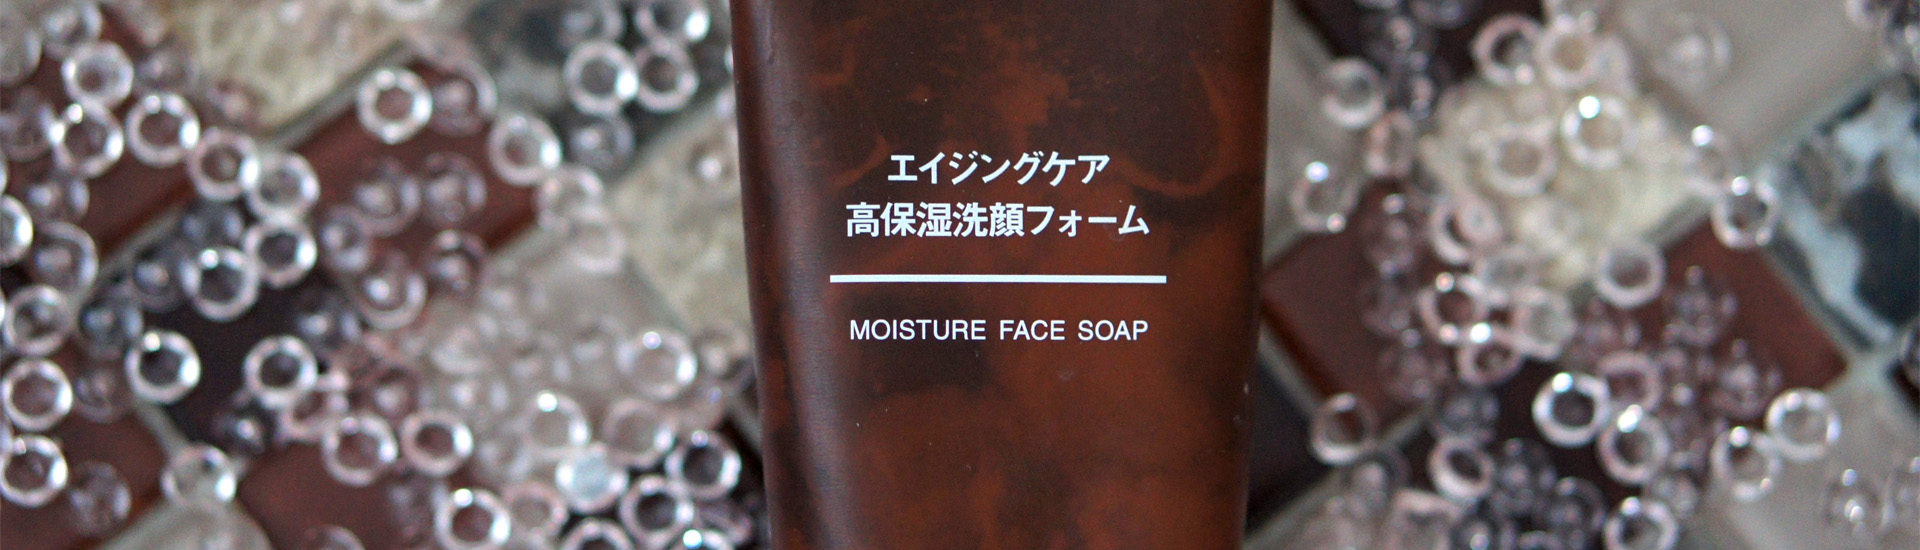 Muji Moisture Face Soap: низкокислотное умывание из Японии